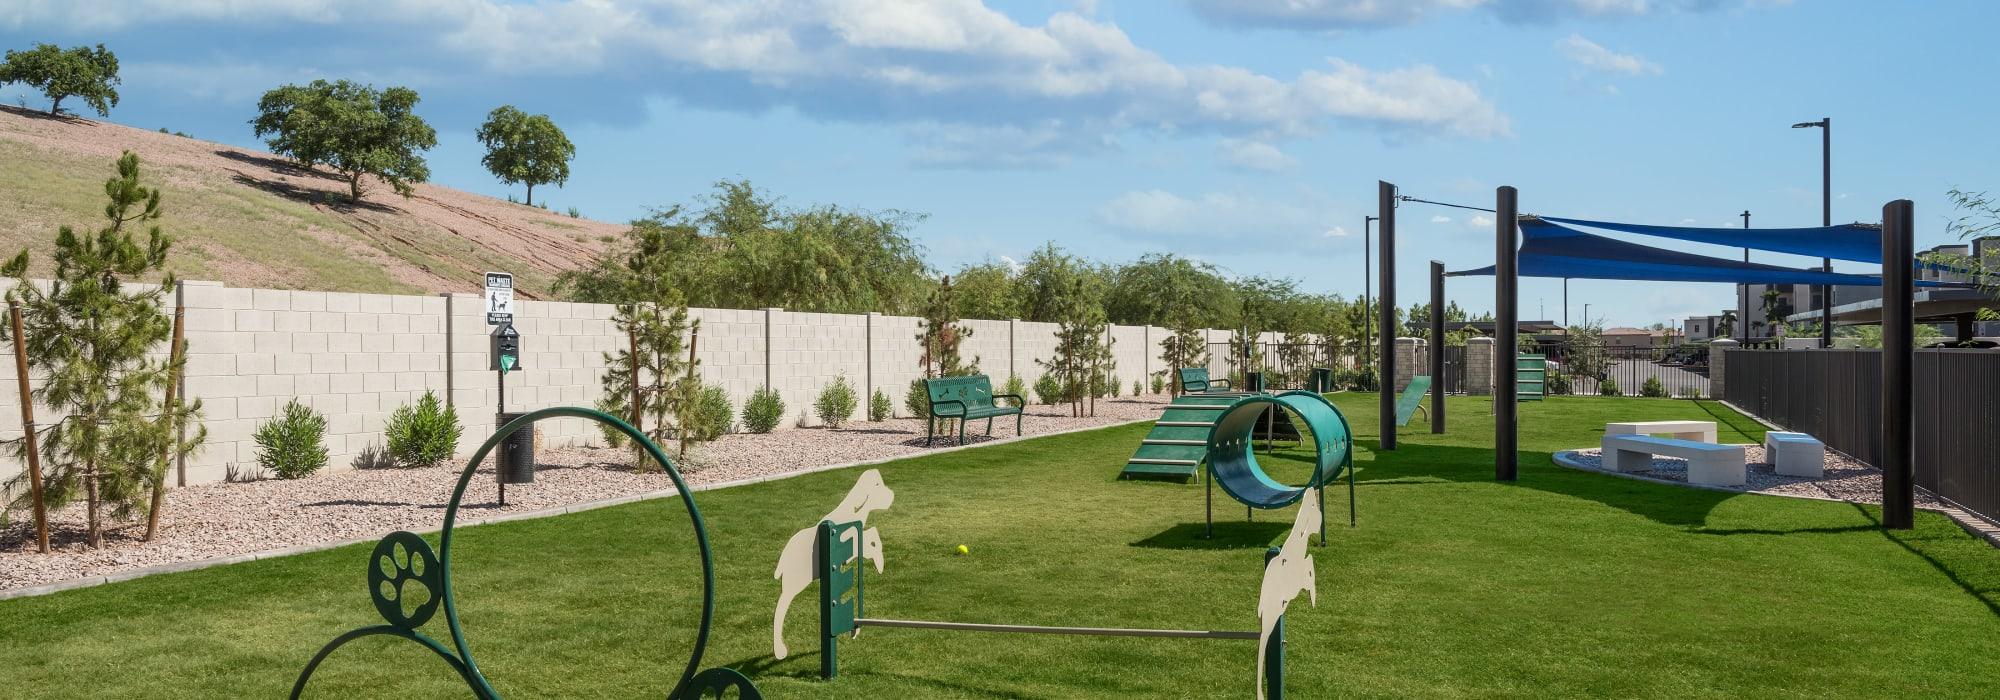 Dog park at Aviva in Mesa, Arizona